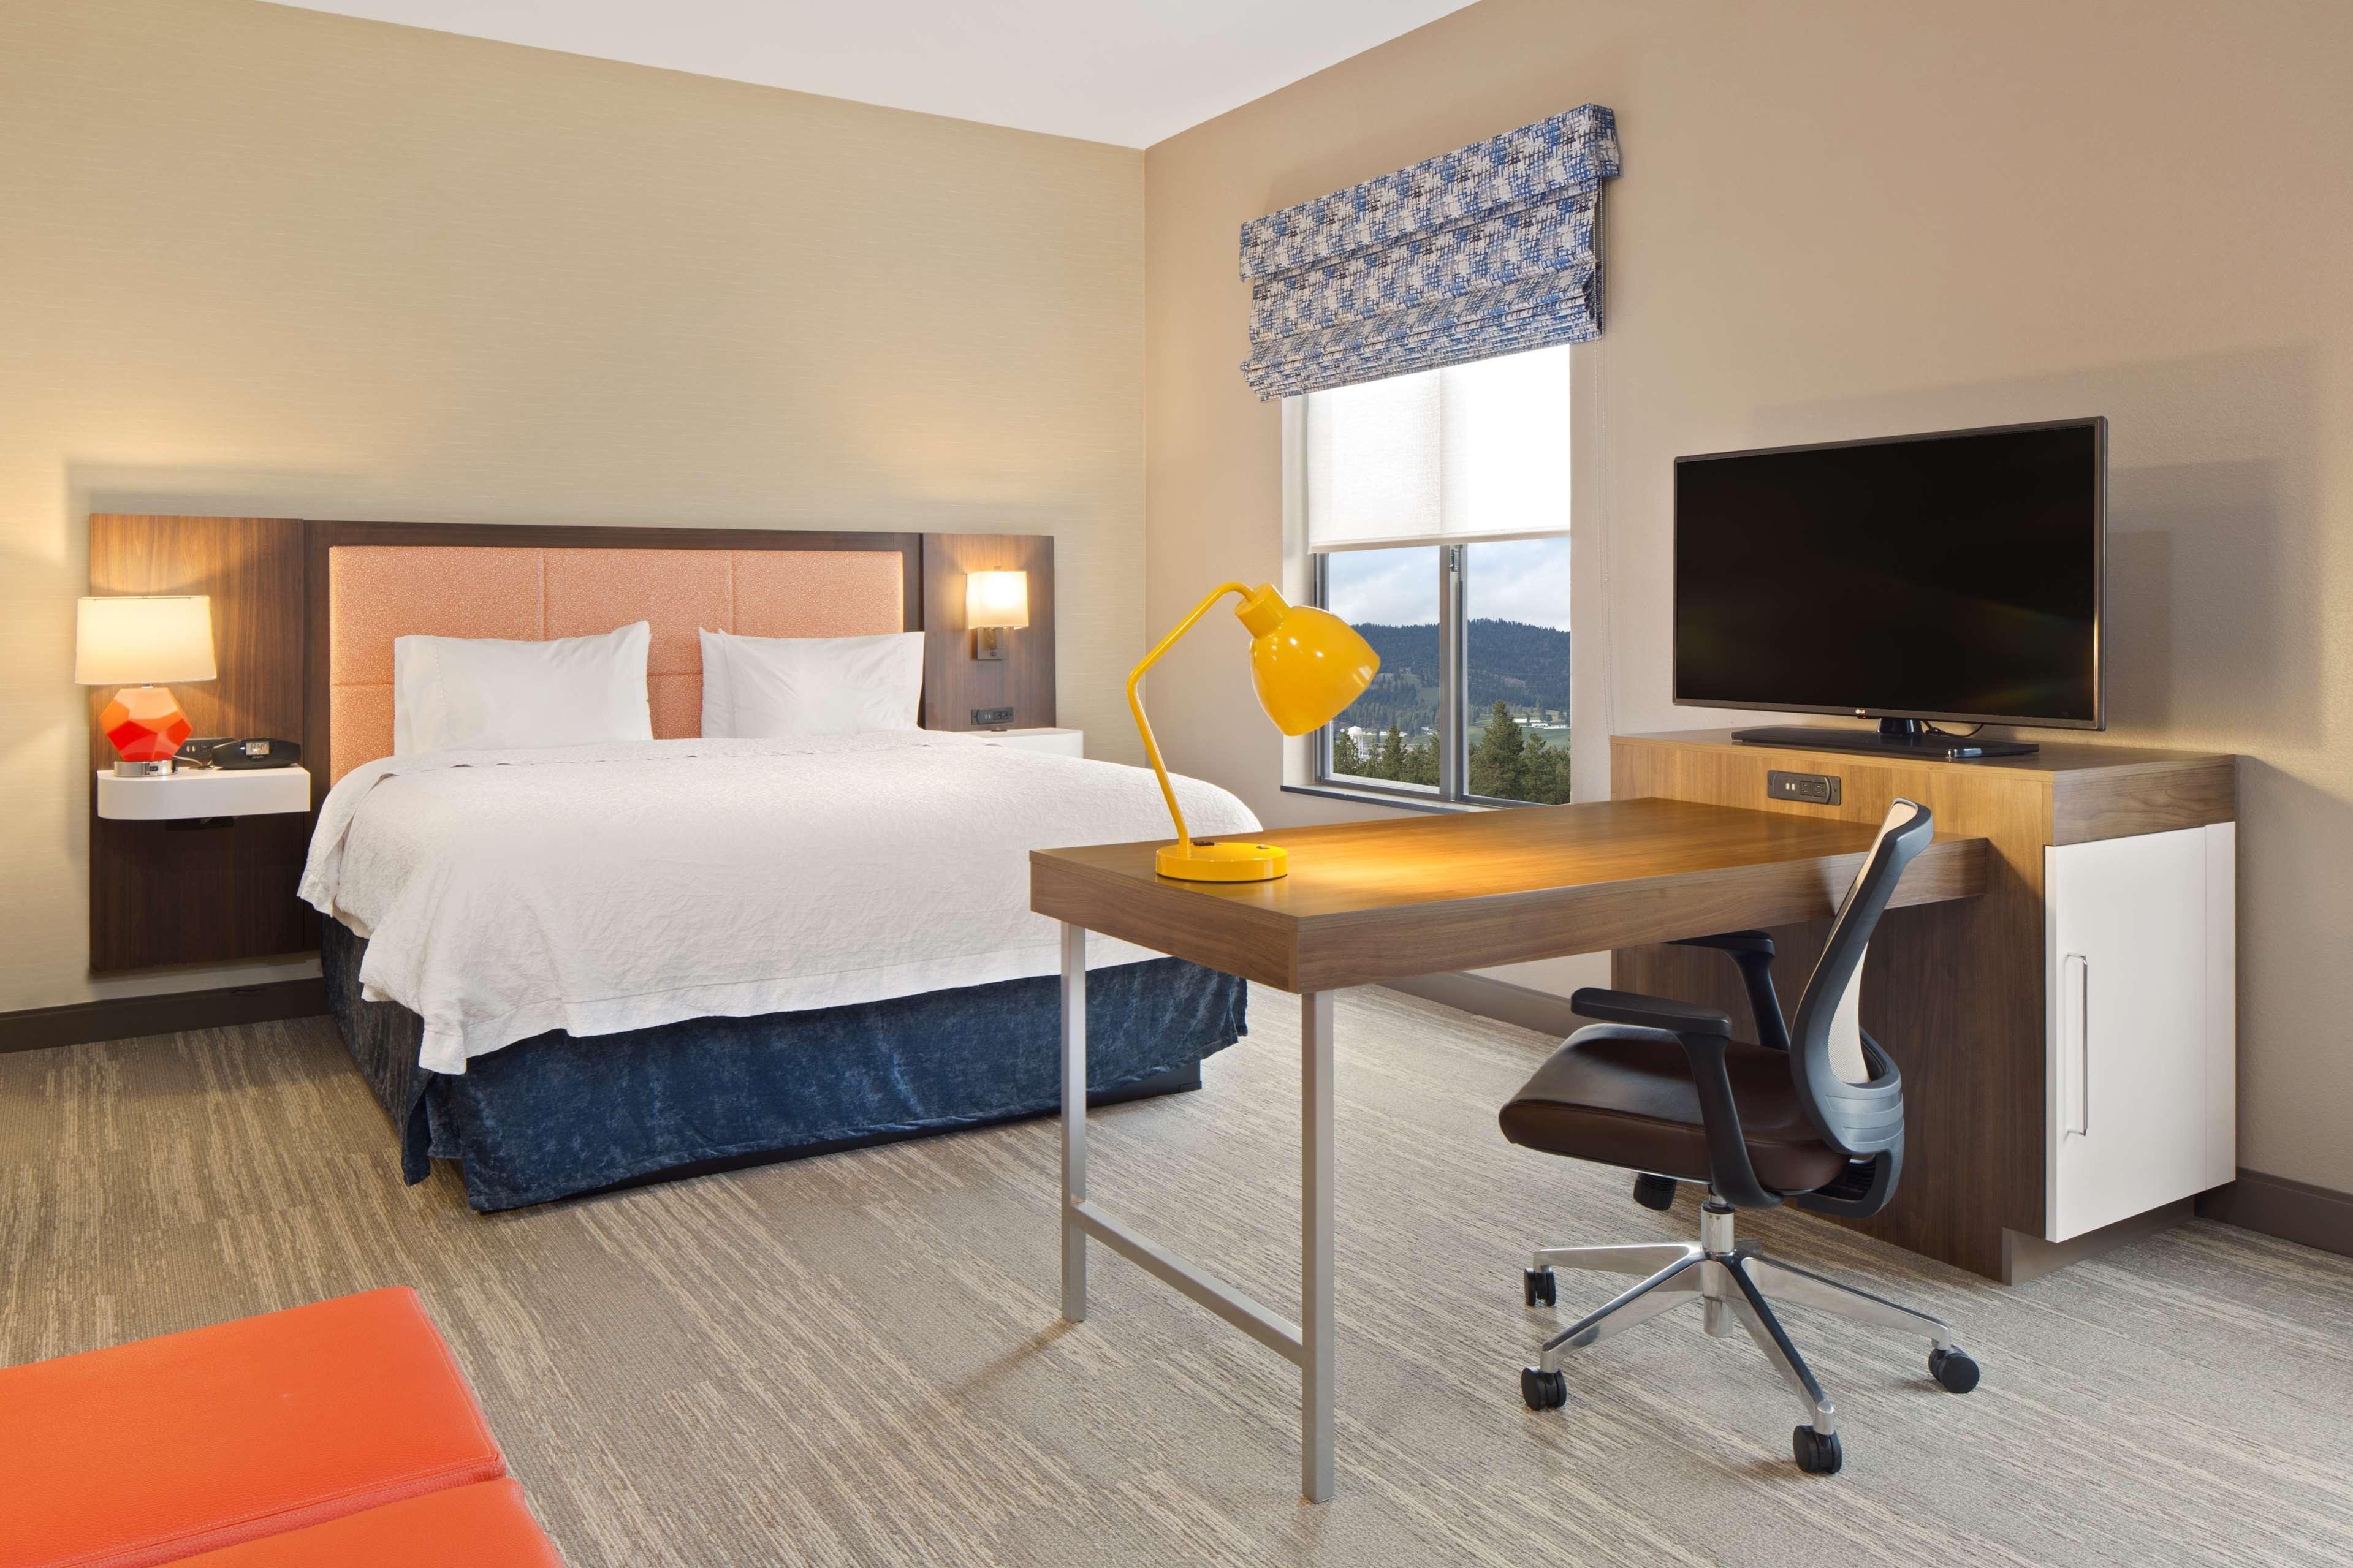 Hampton Inn & Suites Spokane Valley image 24